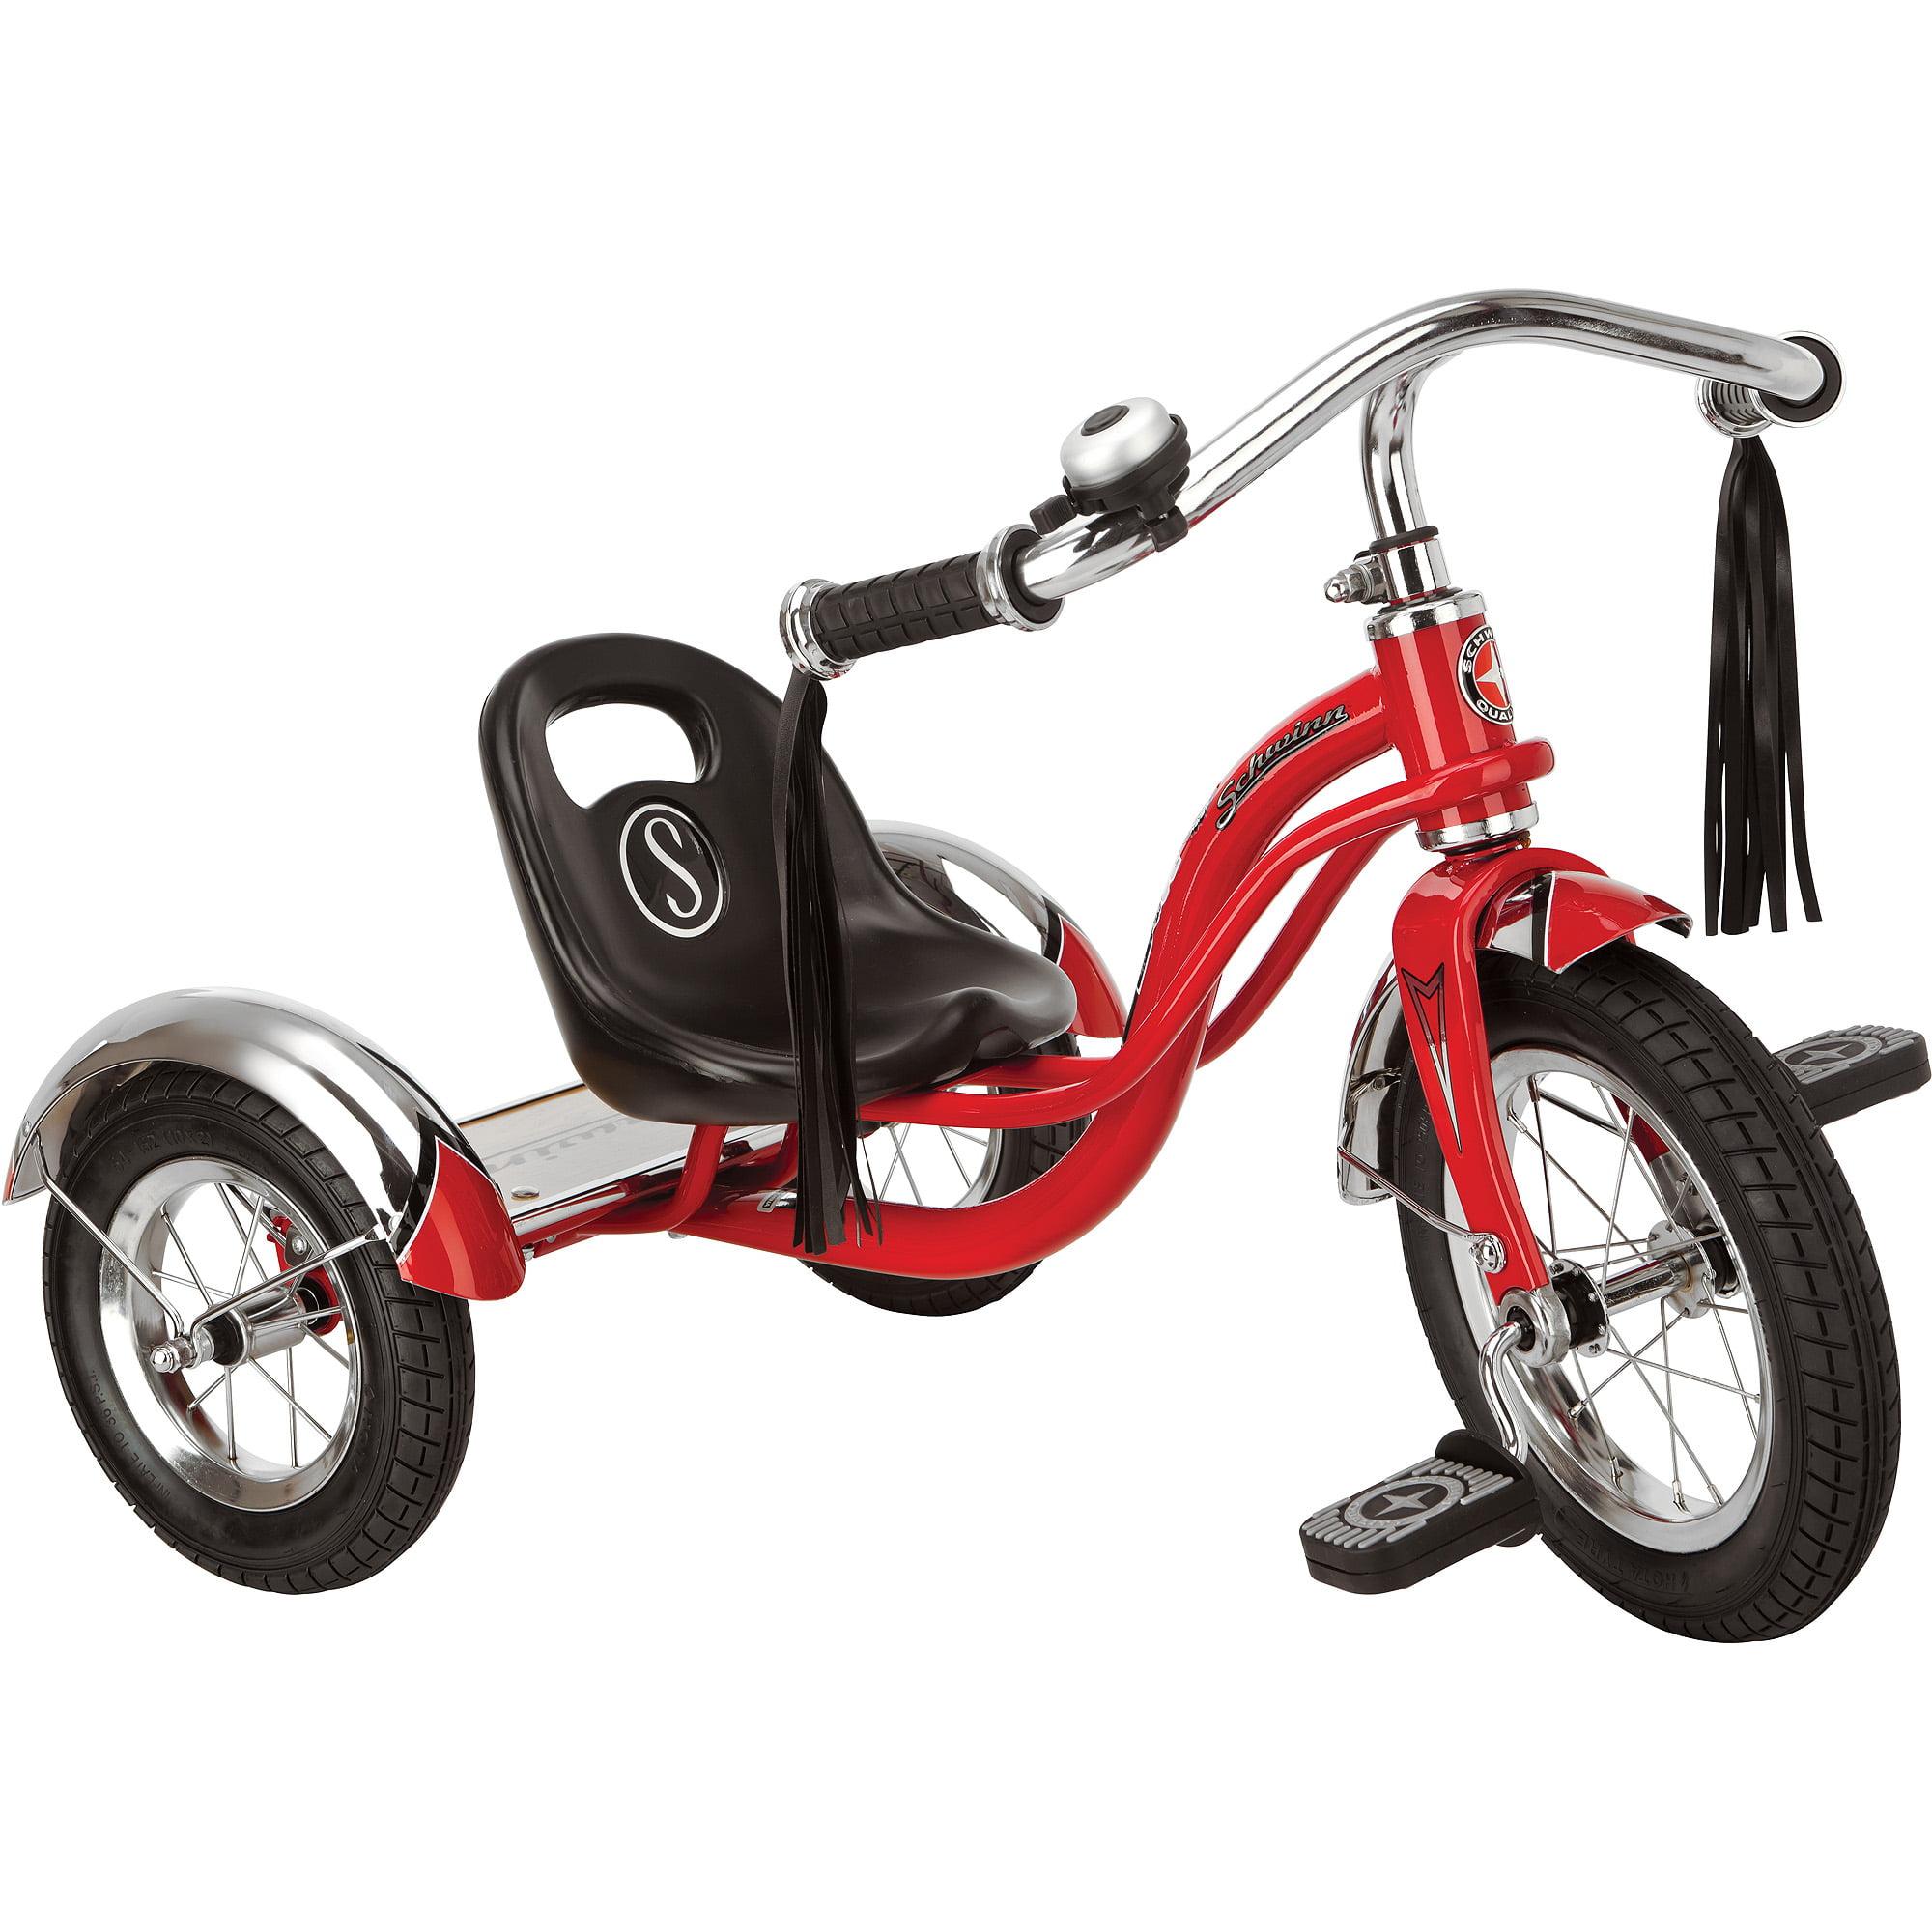 Schwinn Tricycle Parts : Schwinn three wheel bike manual bicycling and the best